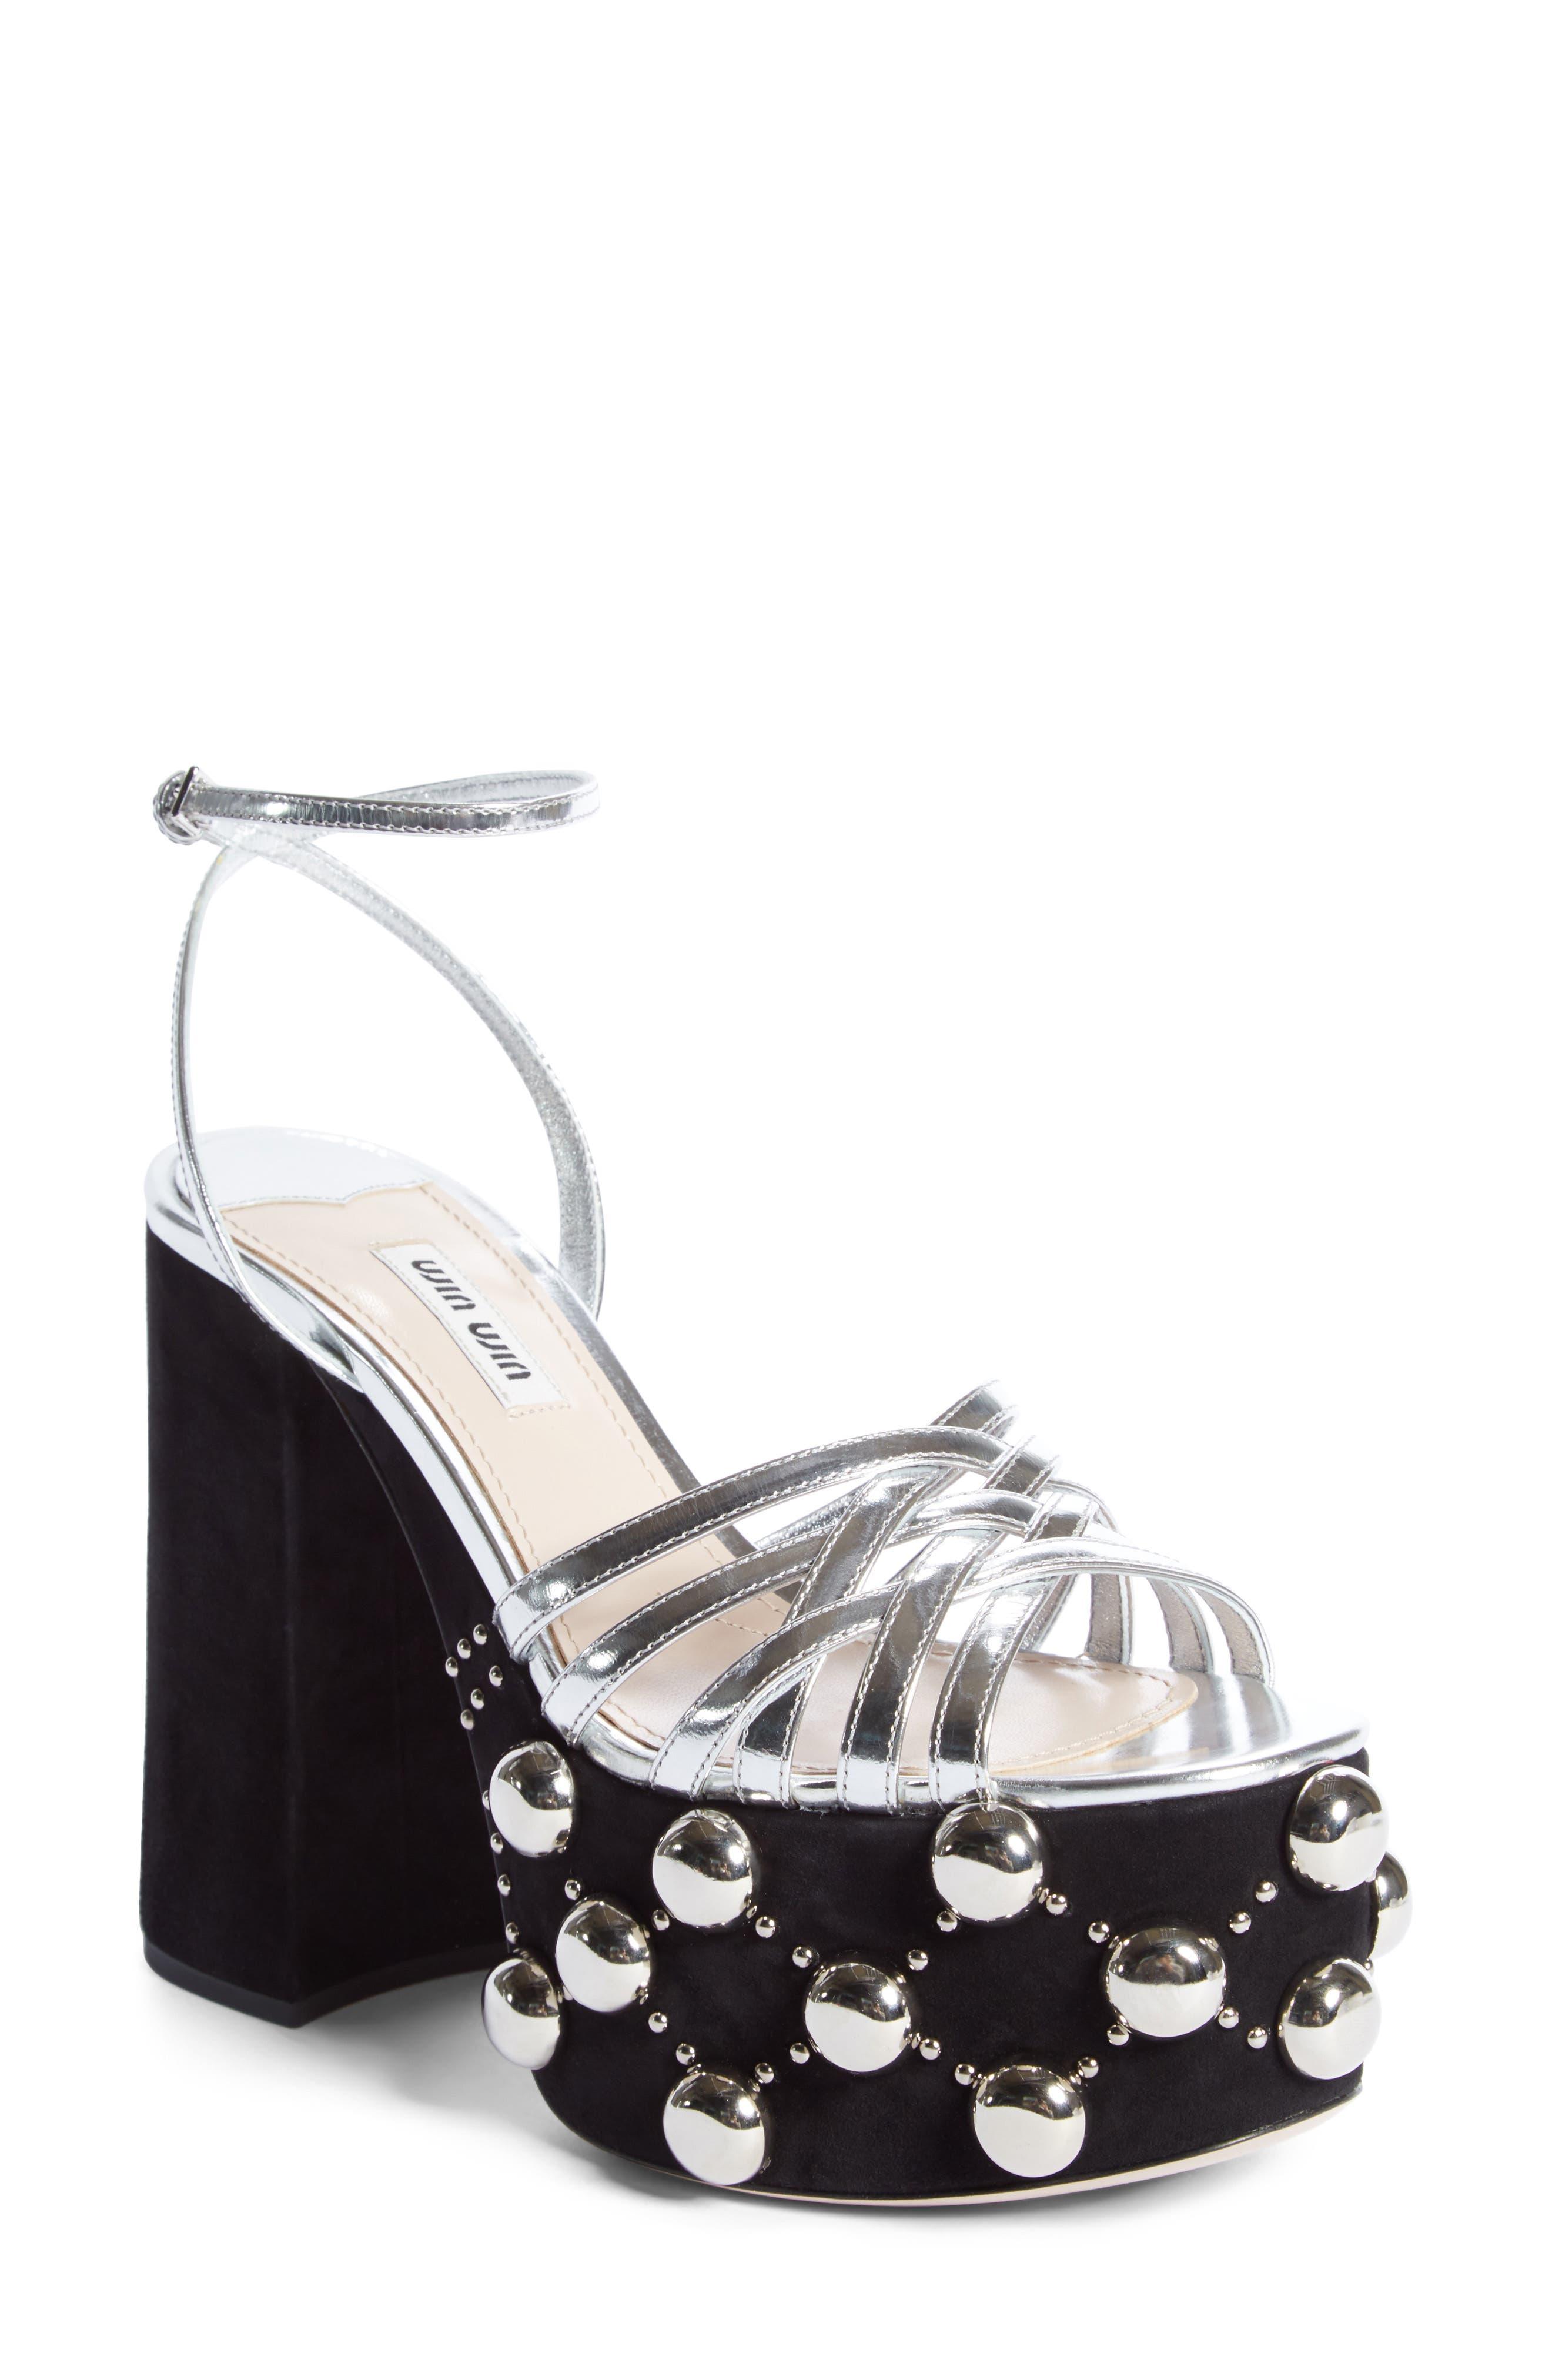 Alternate Image 1 Selected - Miu Miu Studded Platform Sandal (Women)